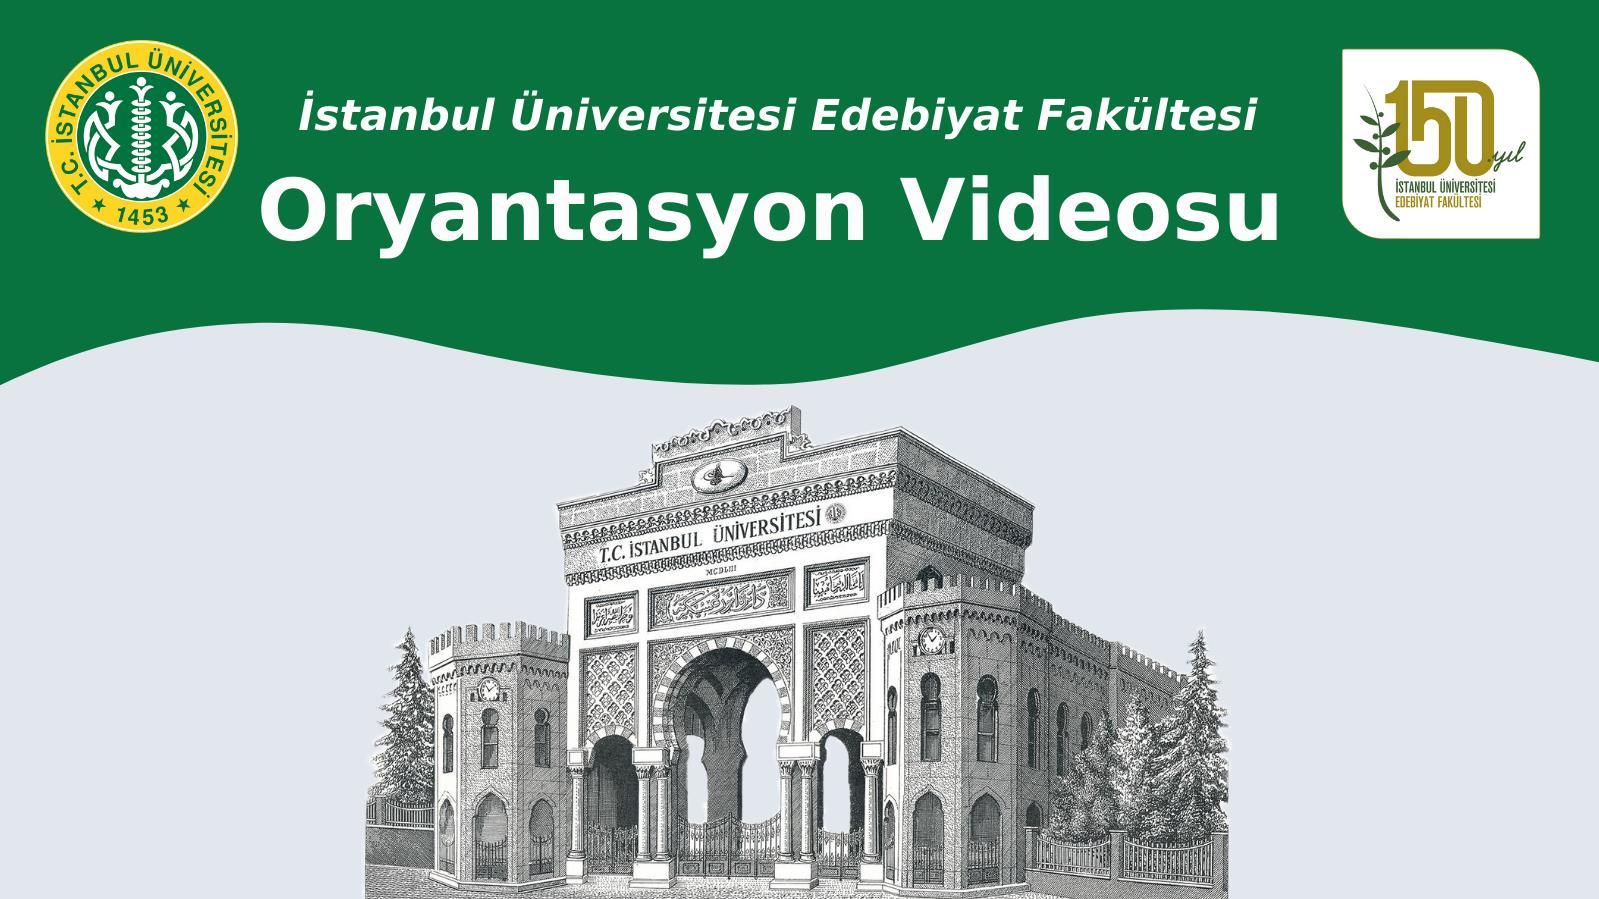 oryantasyon videosu